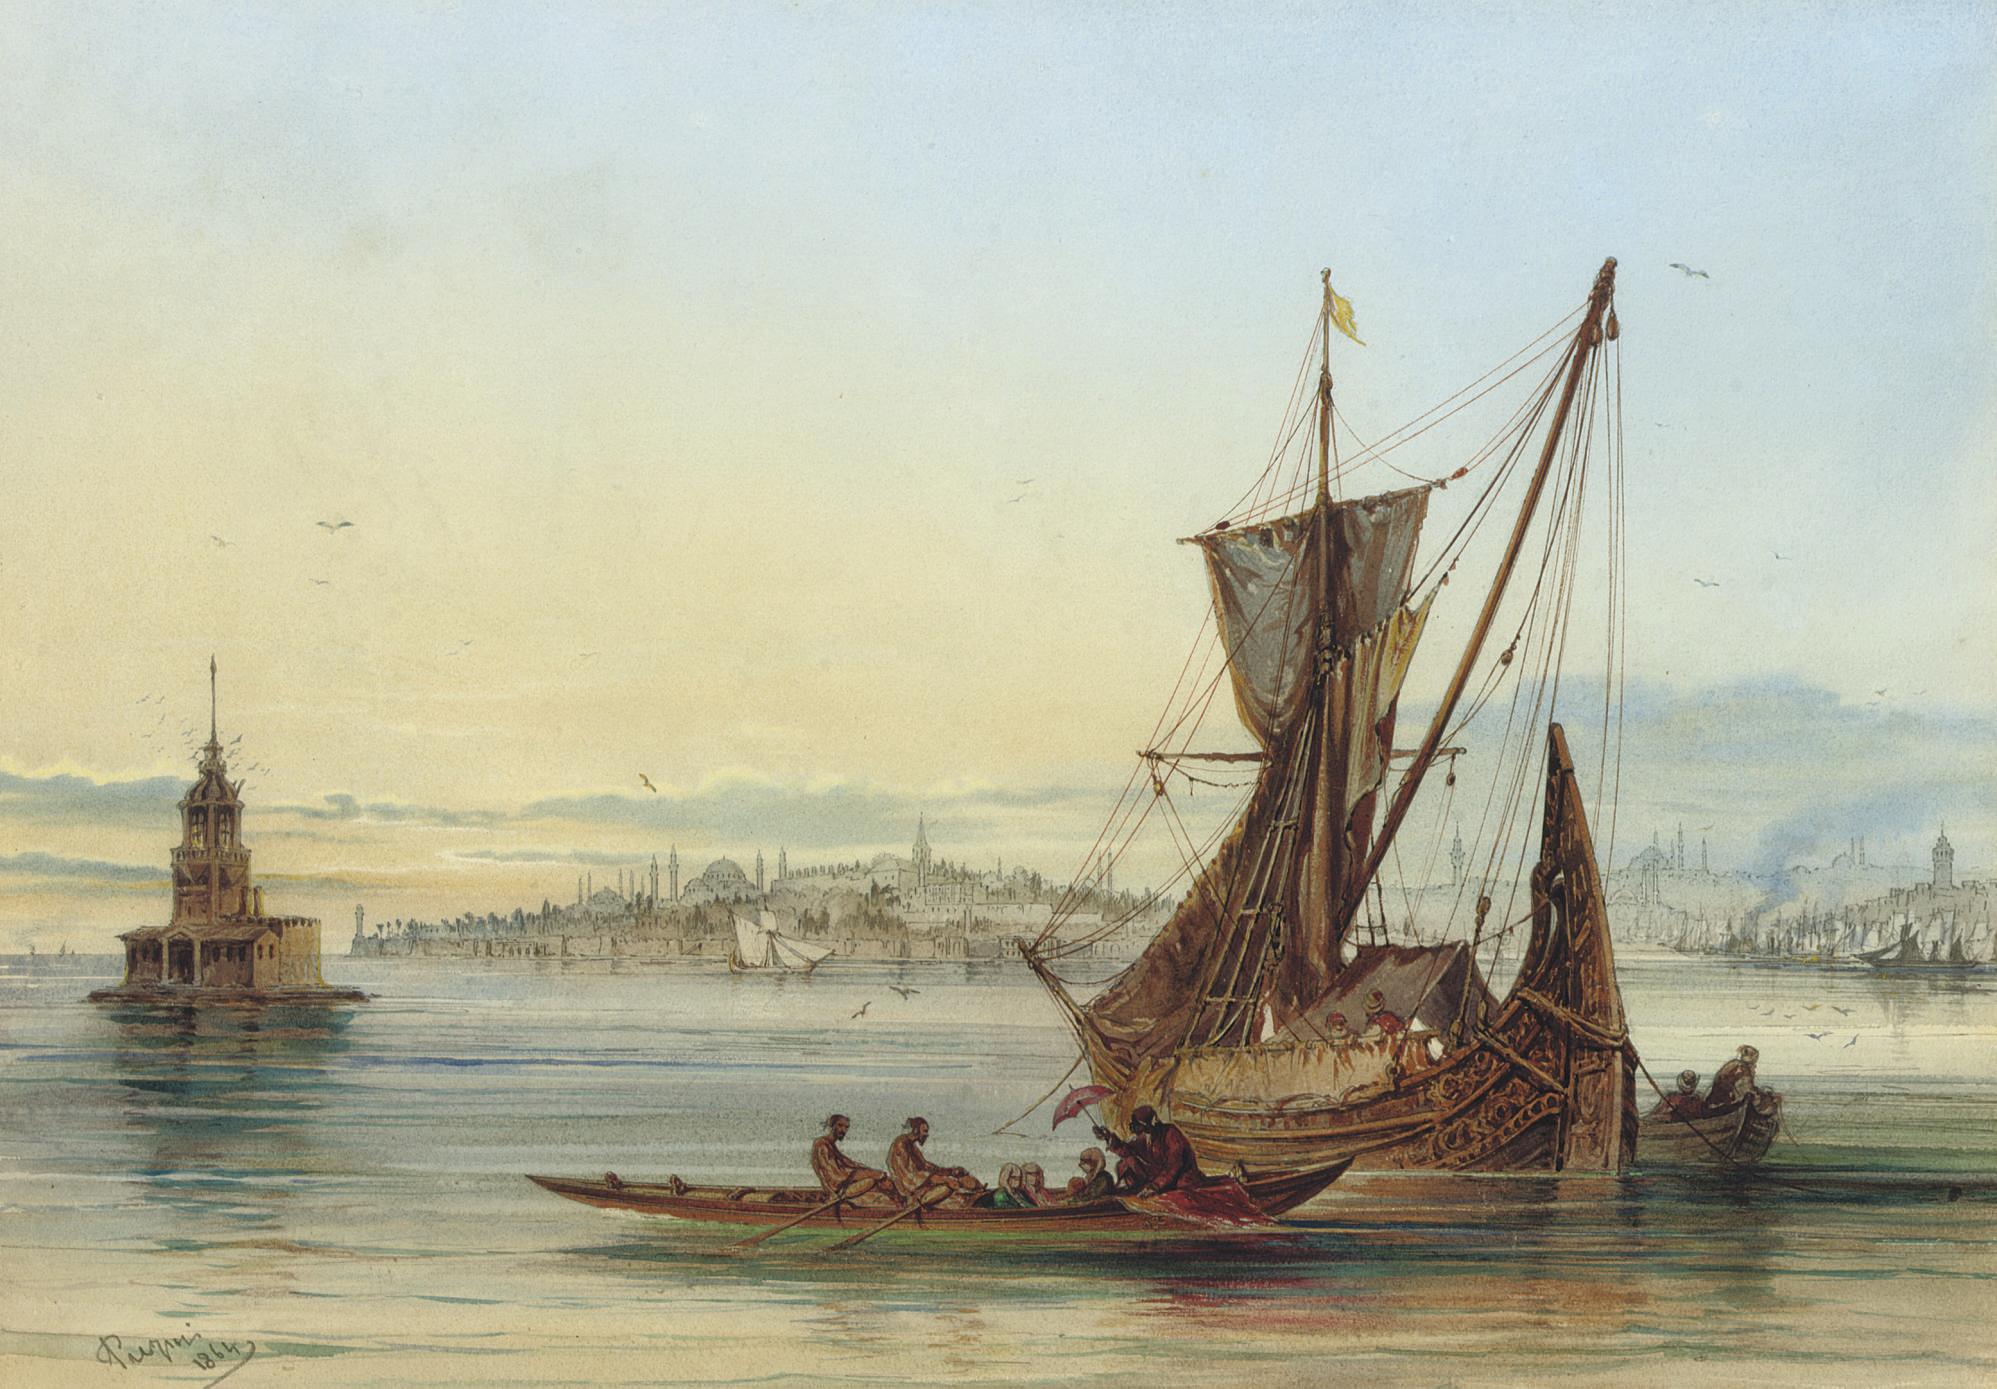 Amadeo Preziosi (Maltese, 1816